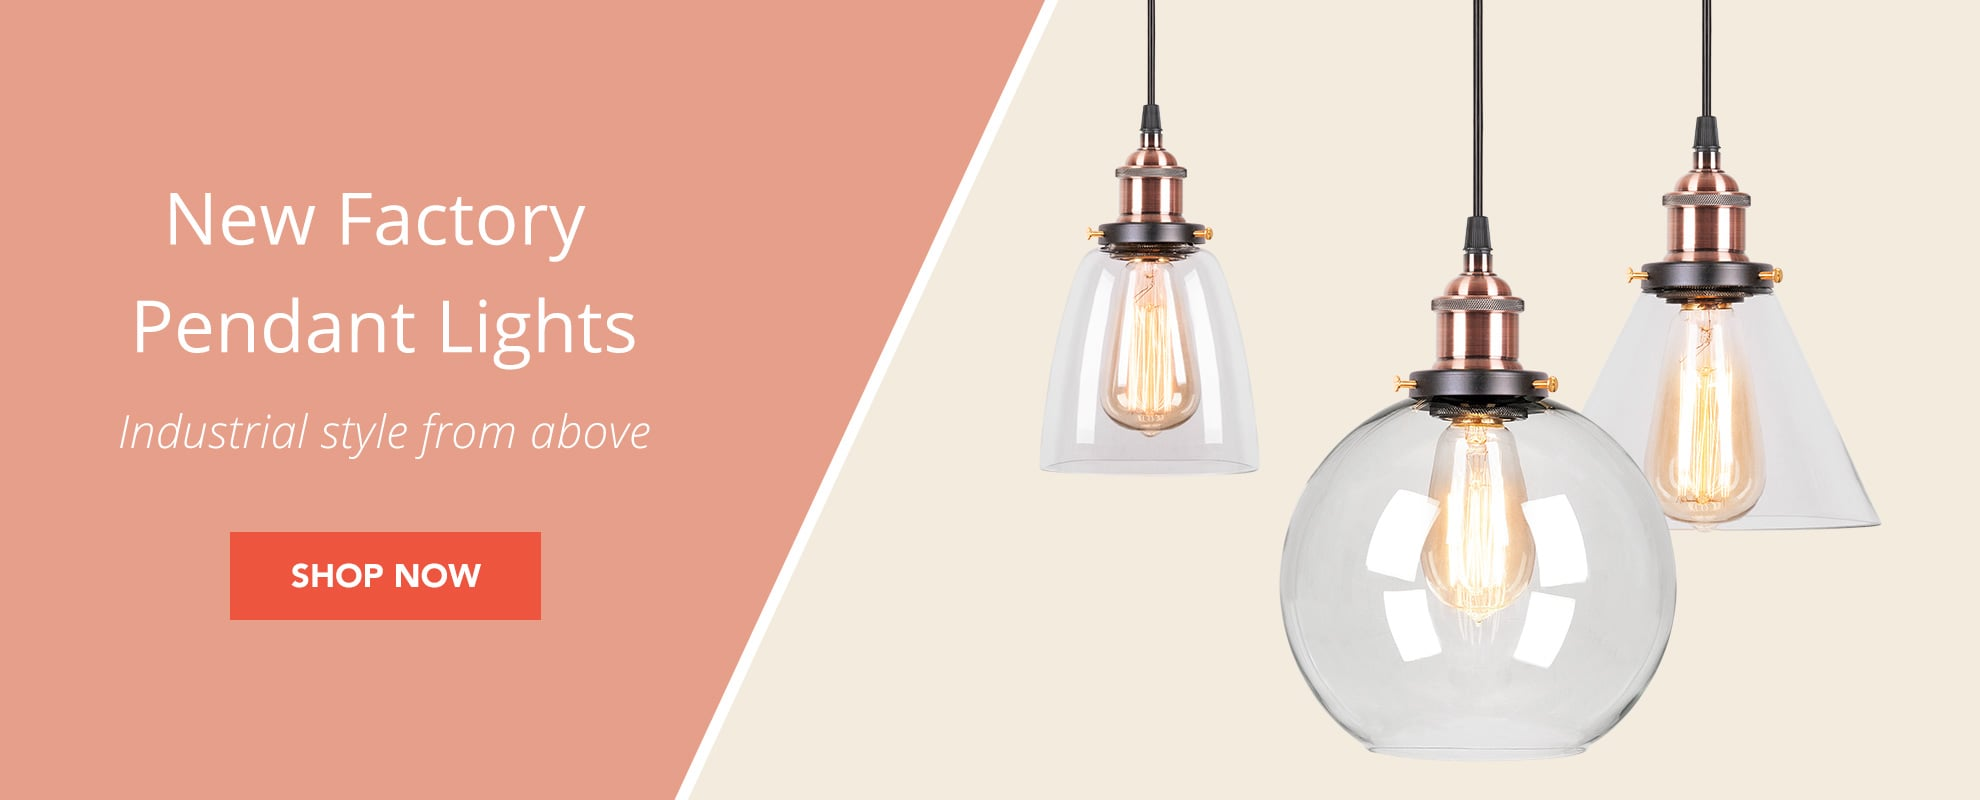 Factory Pendant Lights Hompage - UK